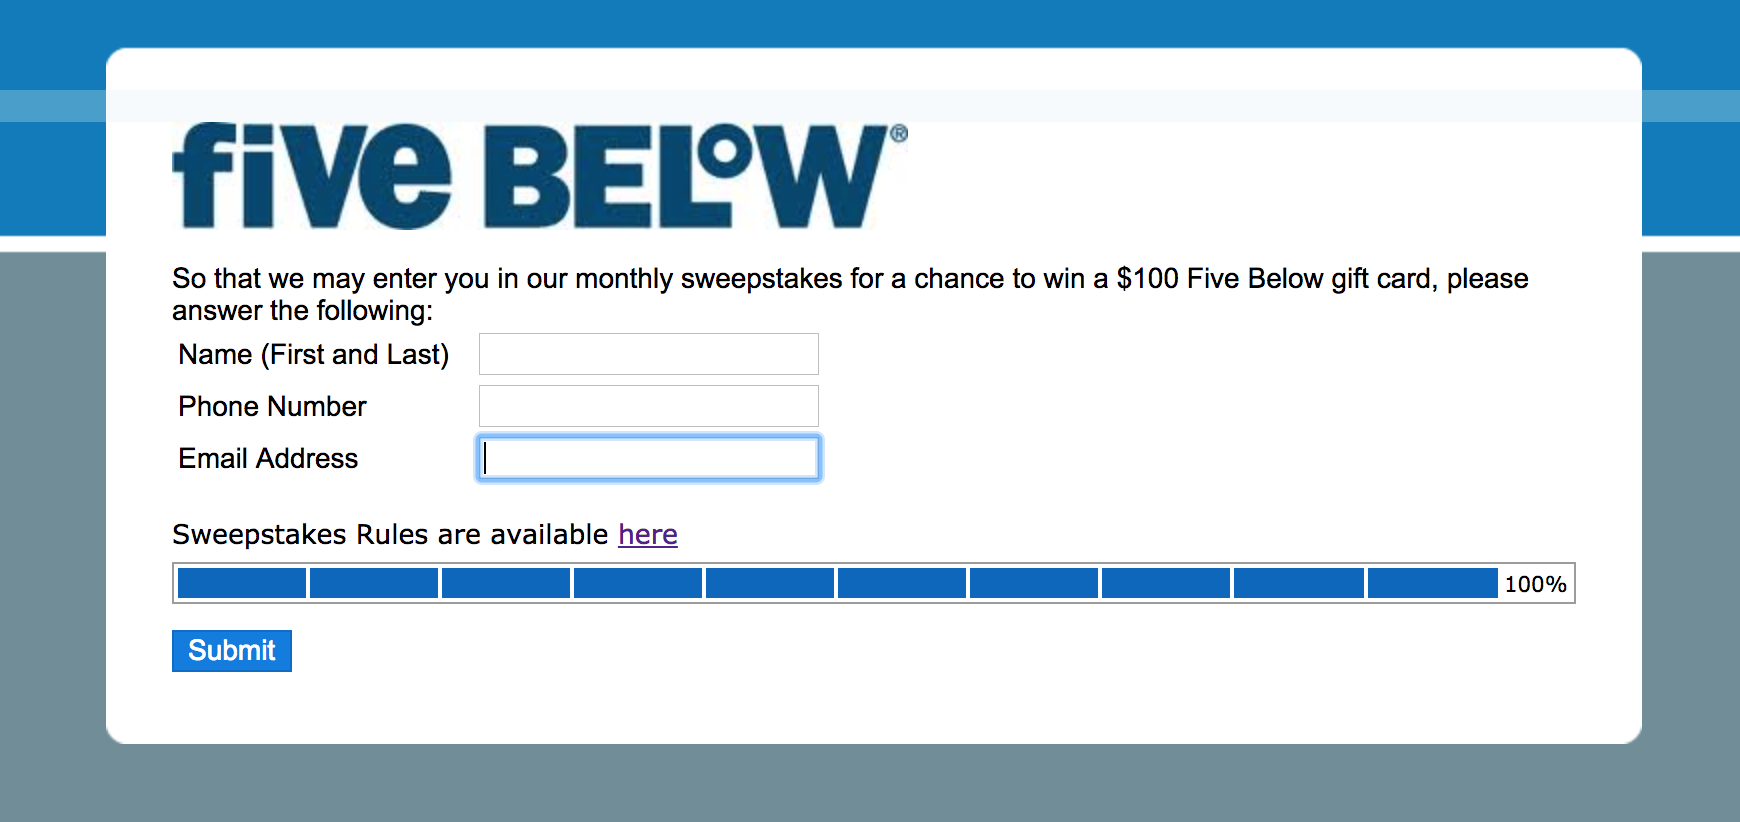 fivebelowsurvey.com prize